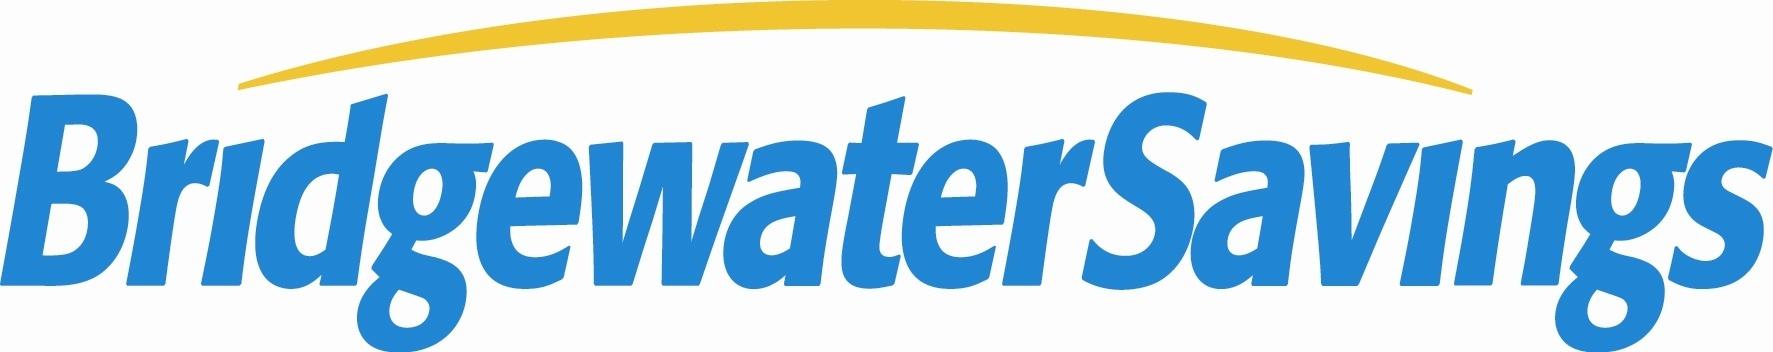 Bridgewater_Savings_Bank_horiz_logo.jpg